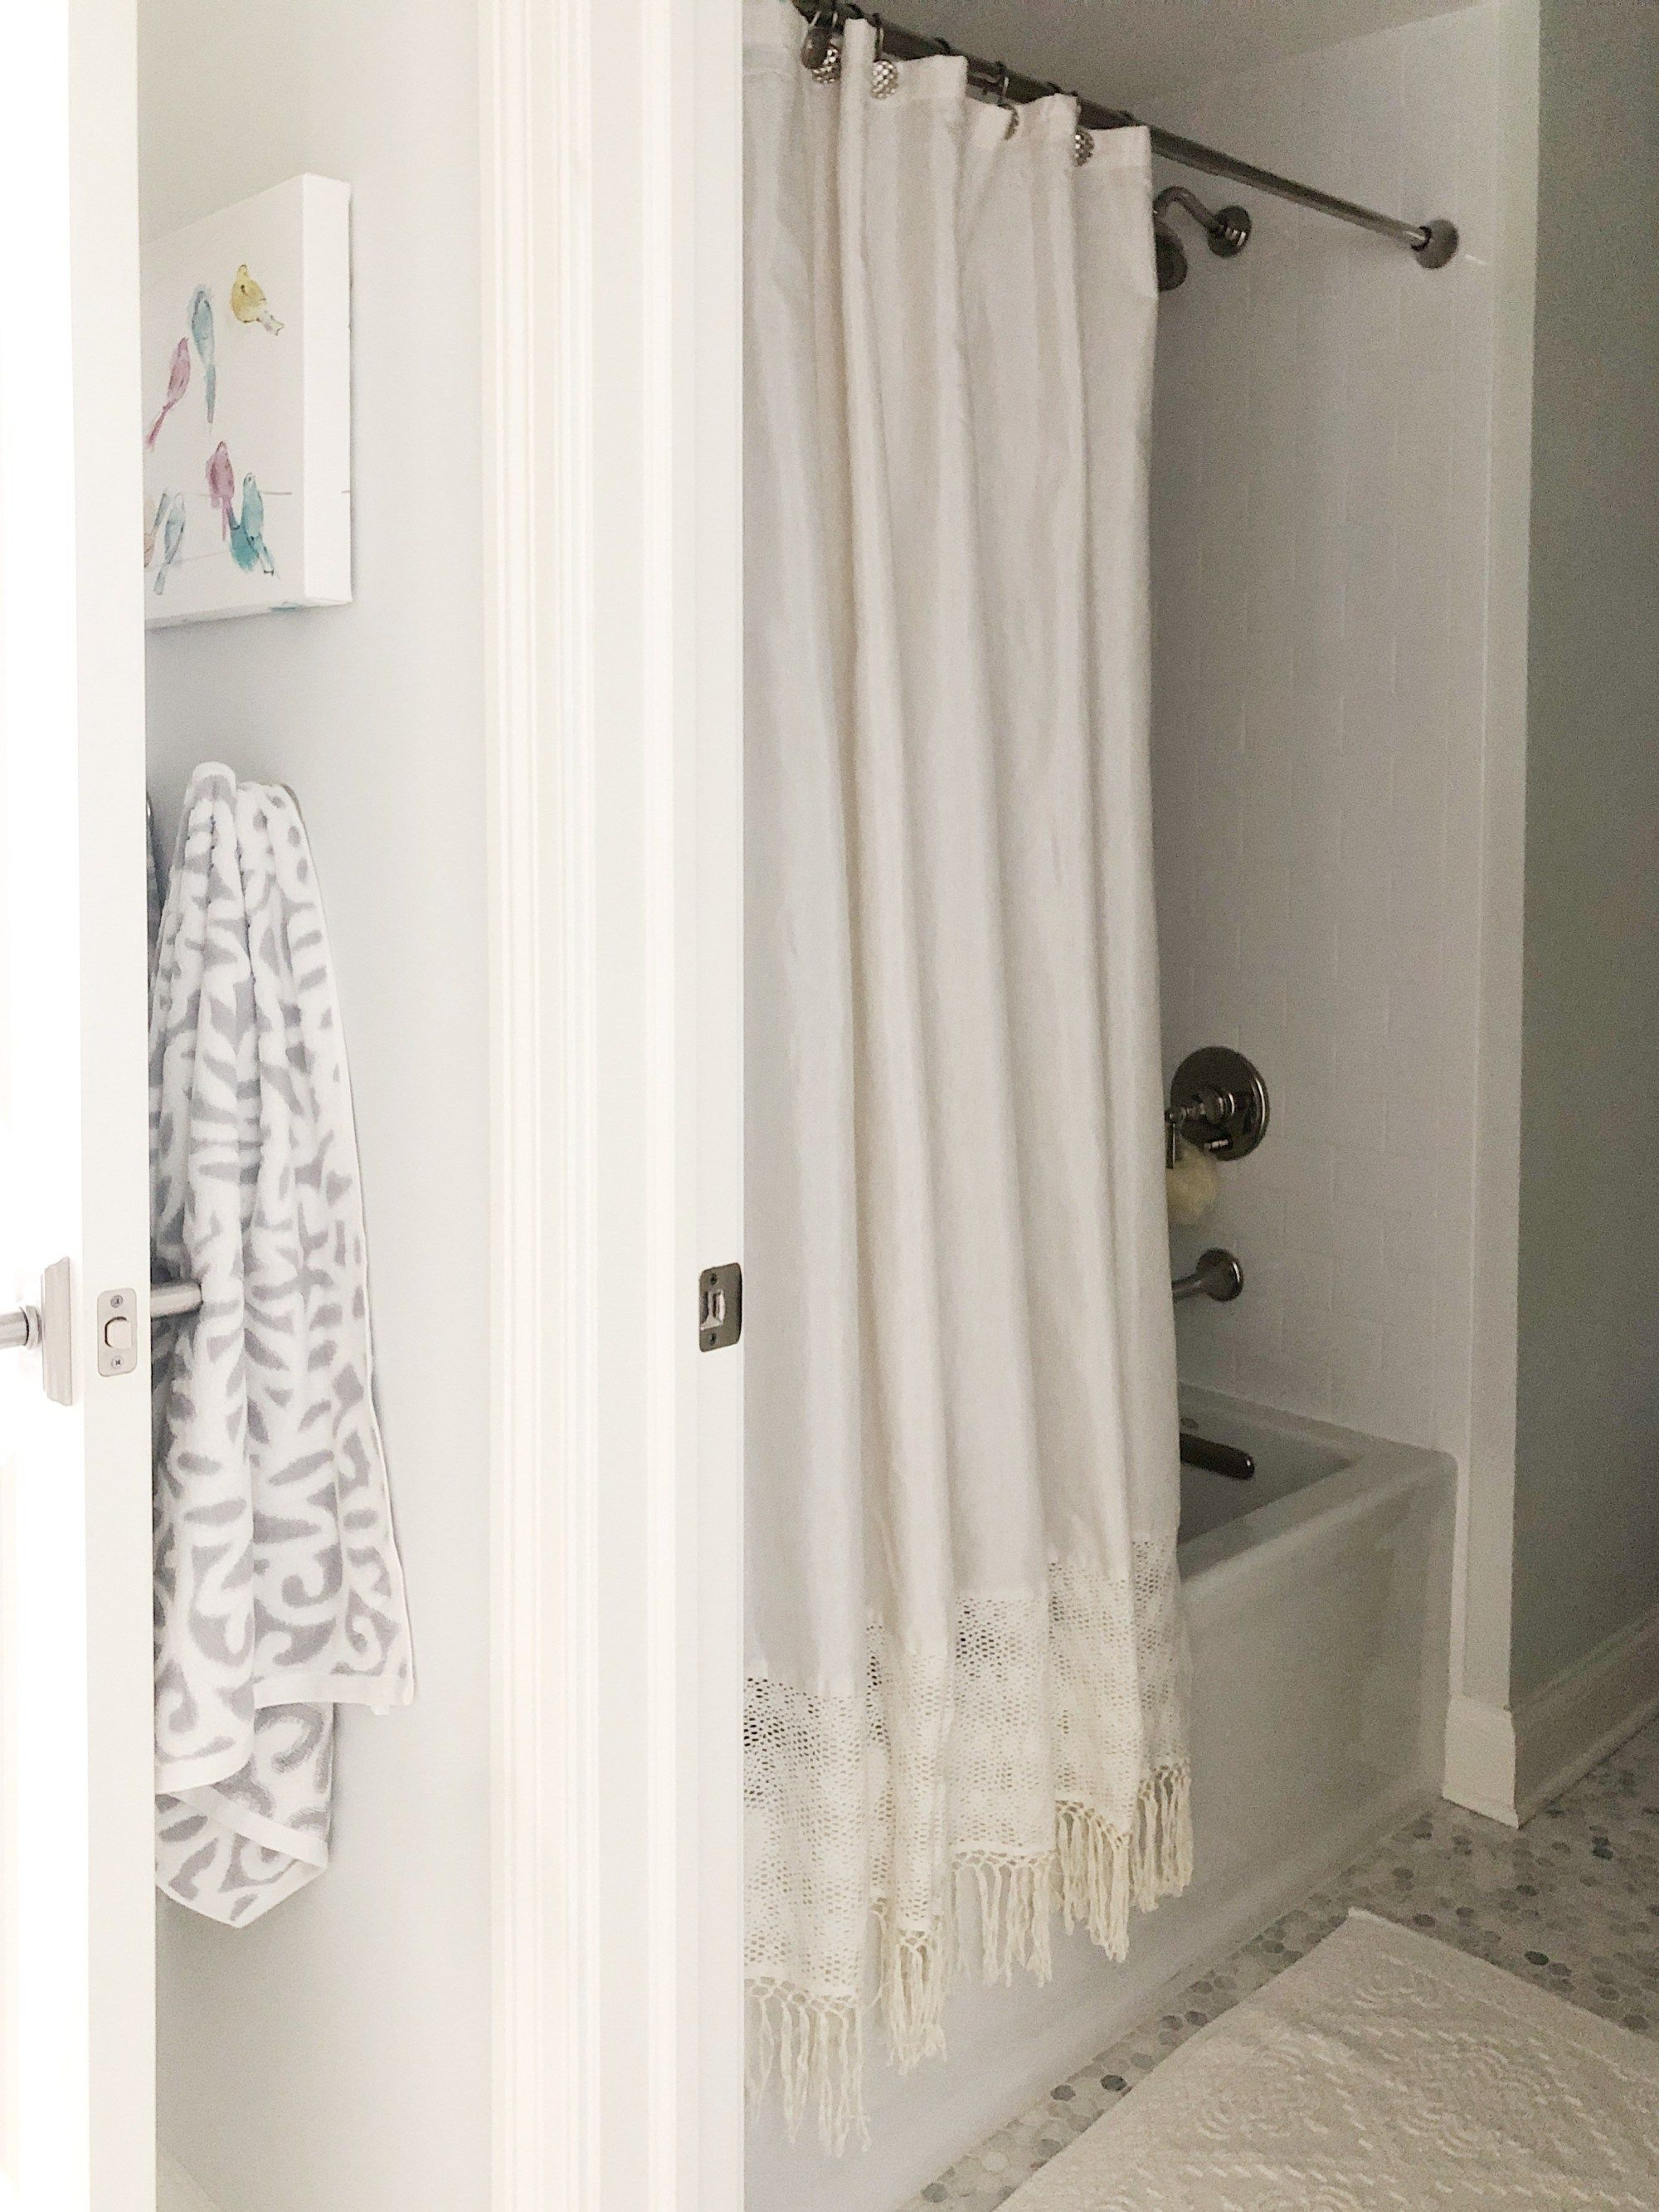 A Vintage Chic Bathroom With Walmart Chic Bathrooms Shabby Chic